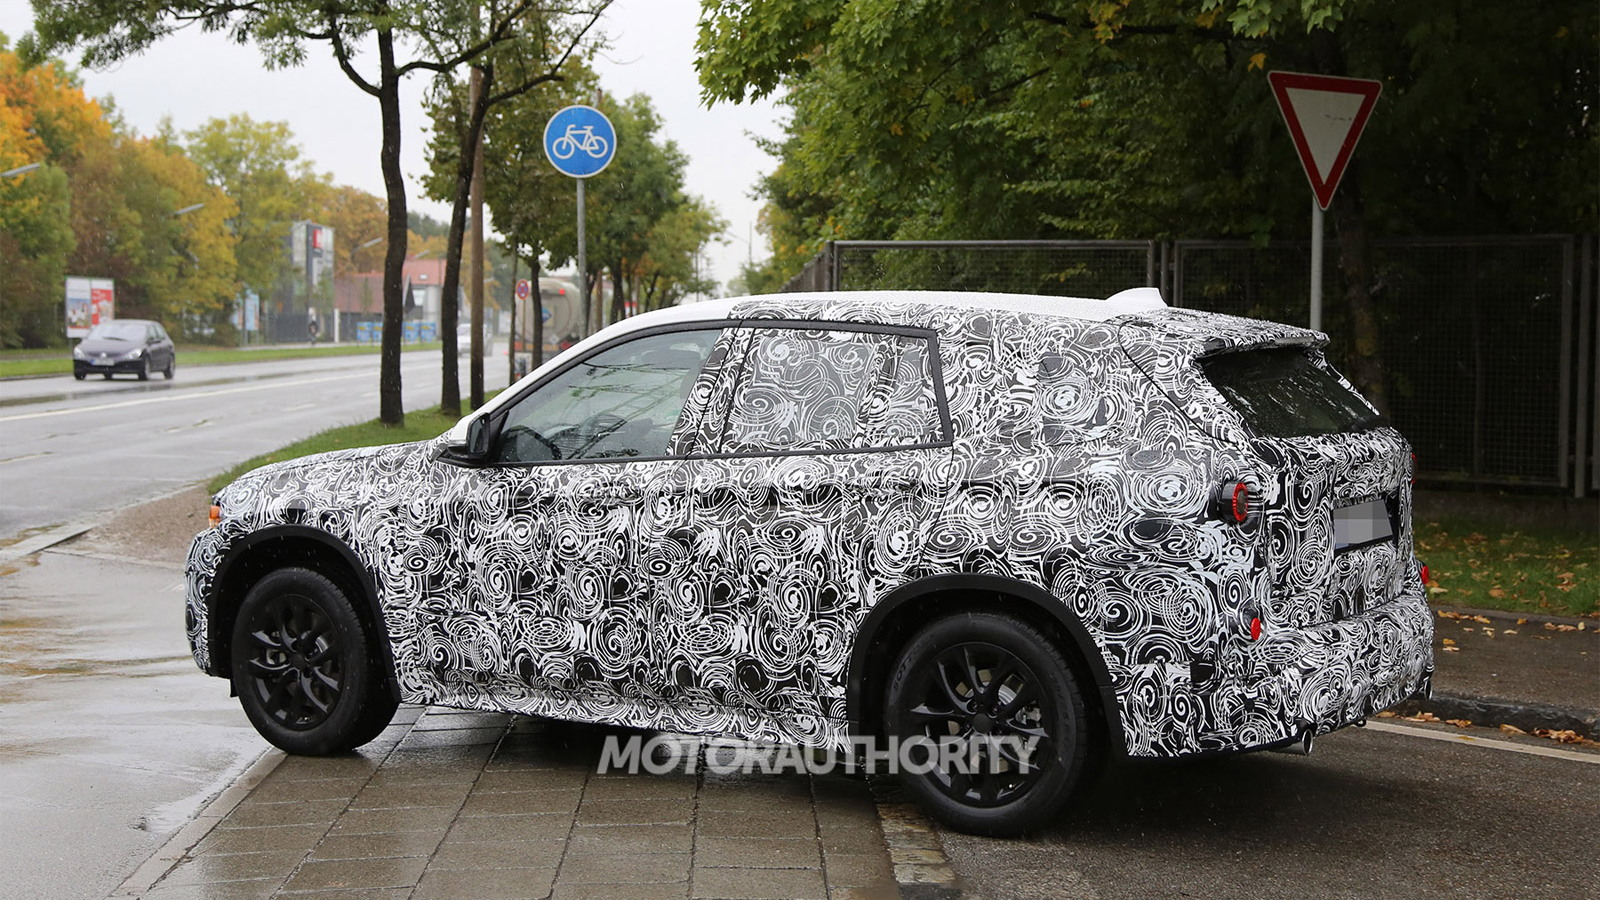 2016 BMW X1 spy shots - Image via S. Baldauf/SB-Medien